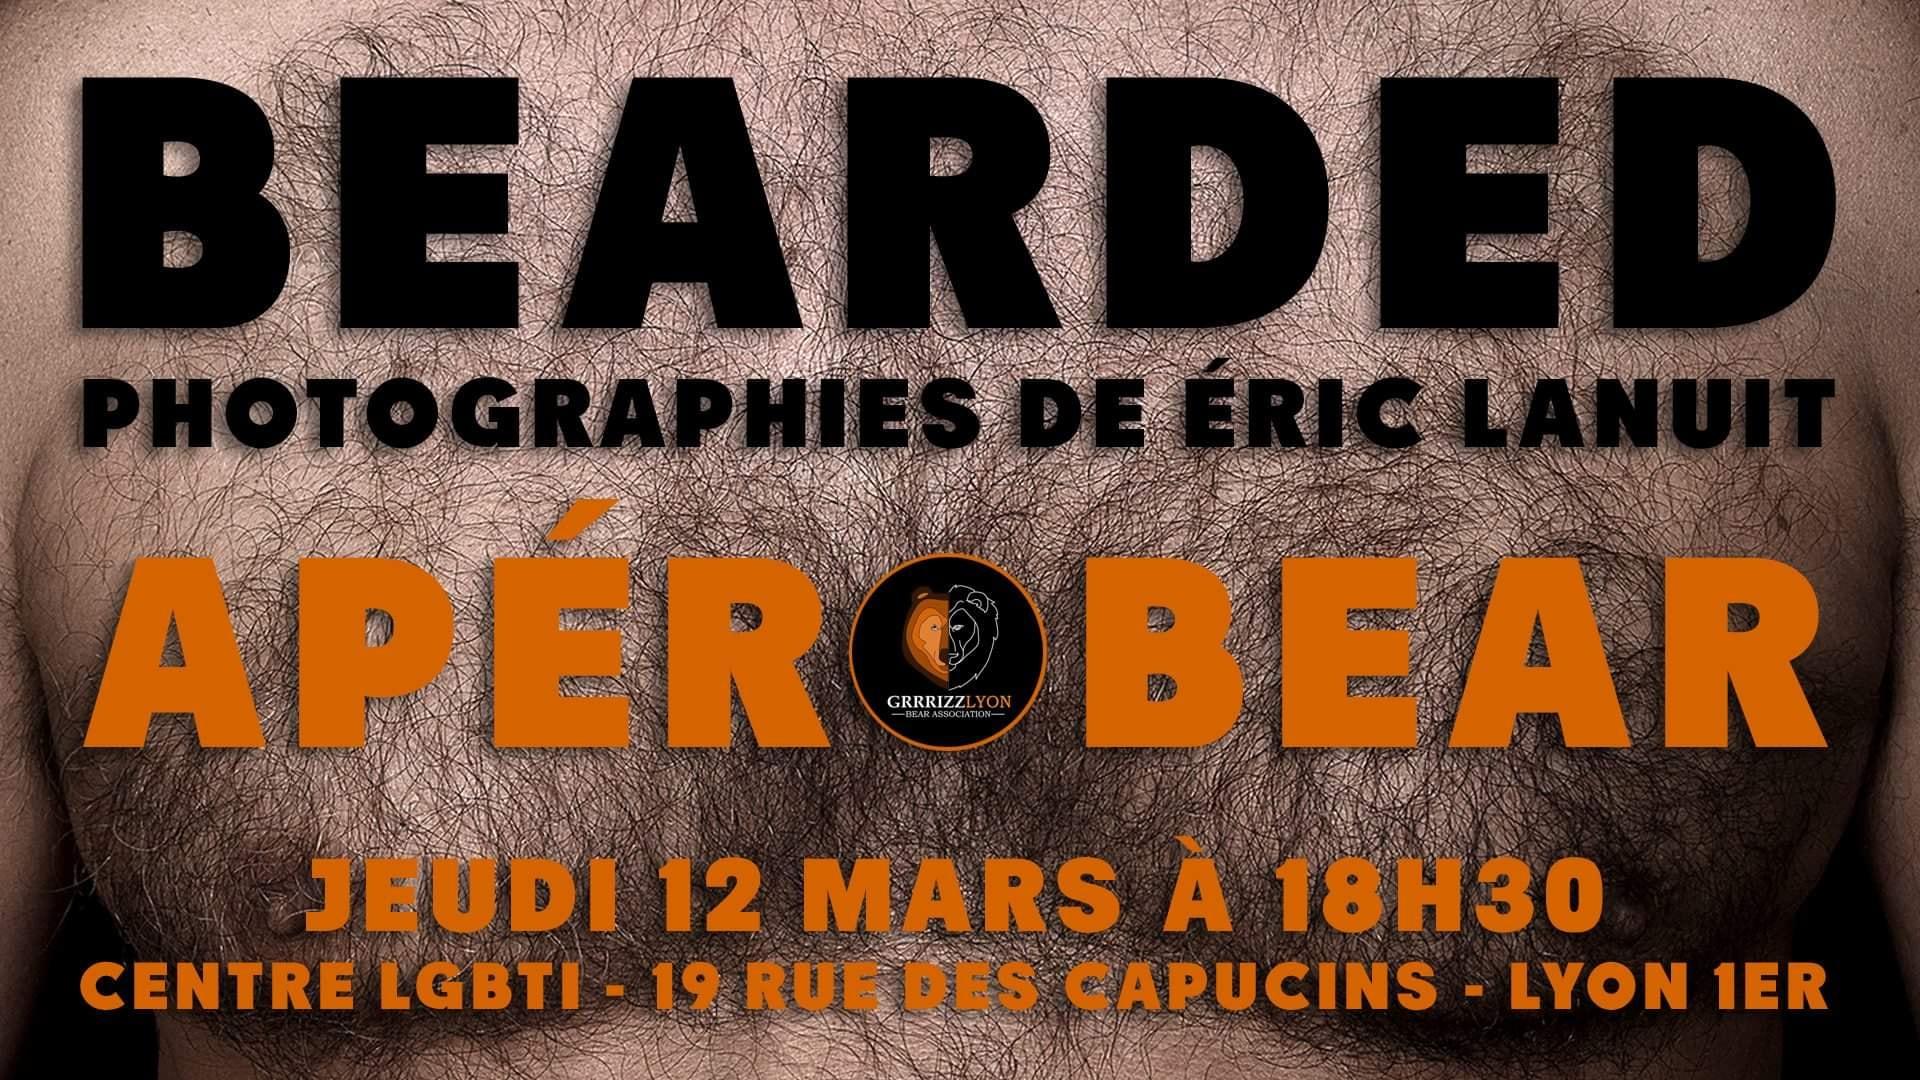 Apéro Bear Bearded Expo by Eric Lanuit, jeudi 12 mars 18h30, Centre LGBTI+